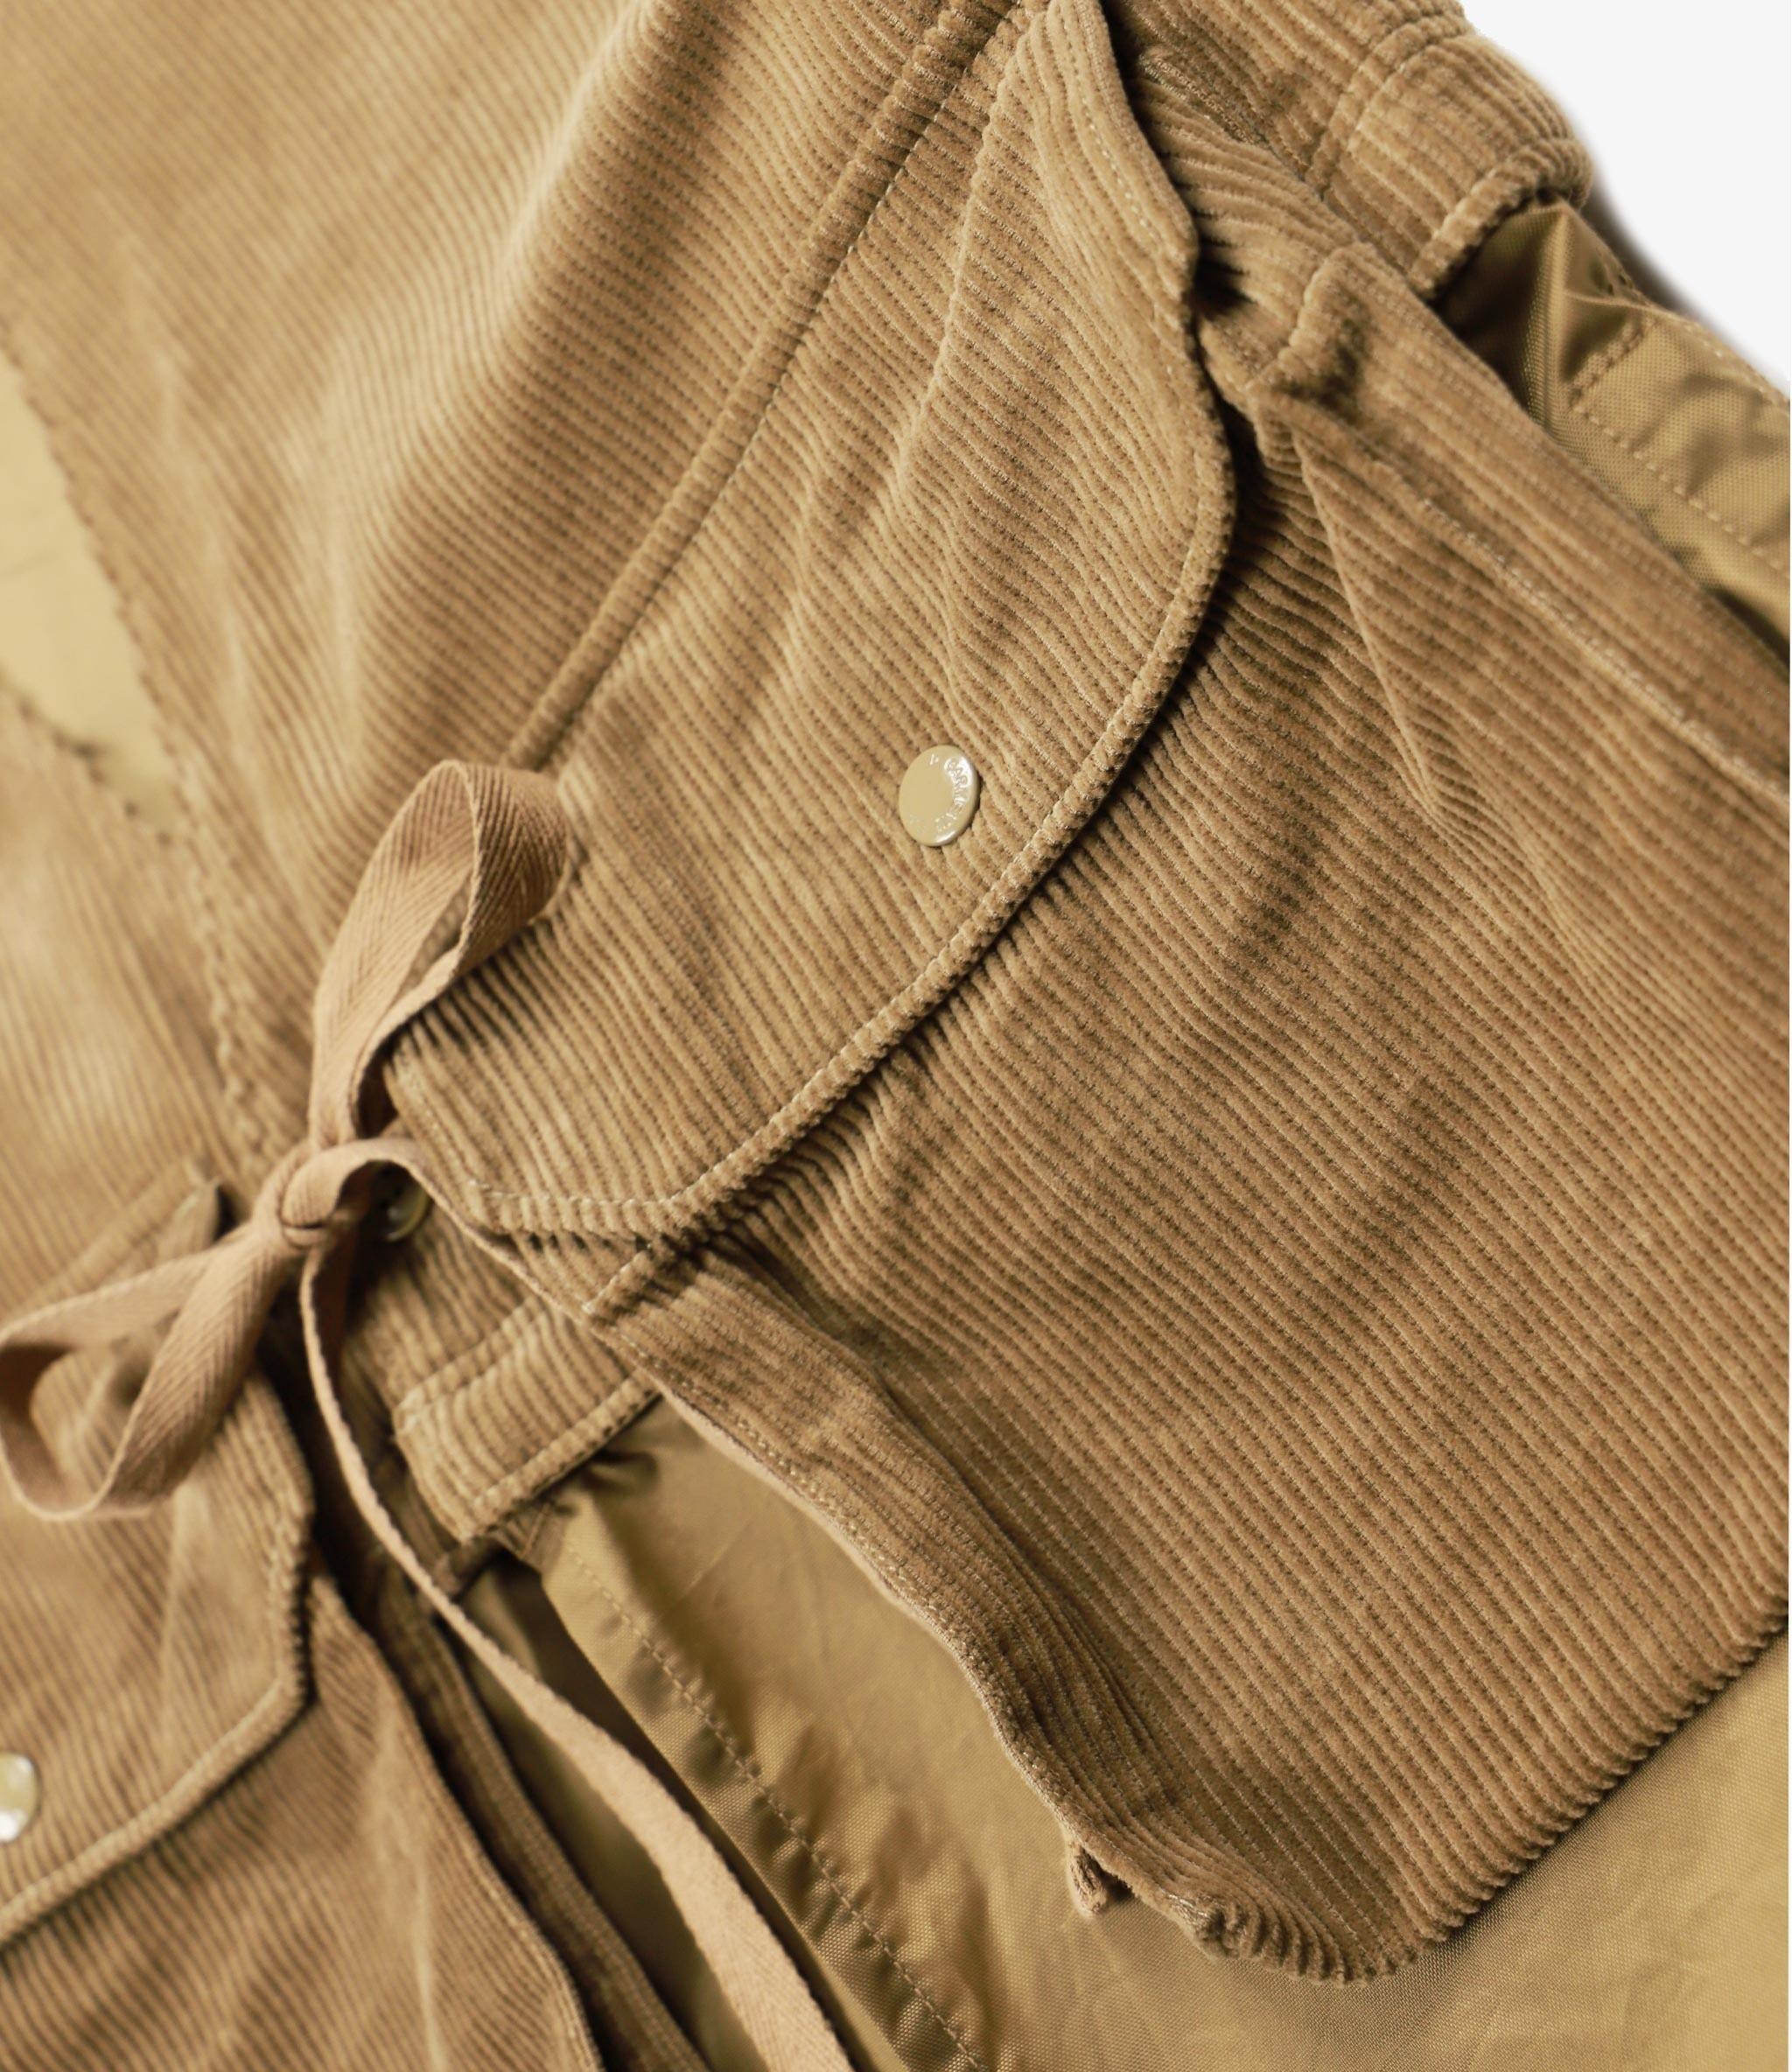 Engineered Garments Long Fowl Vest - Khaki 8W Corduroy